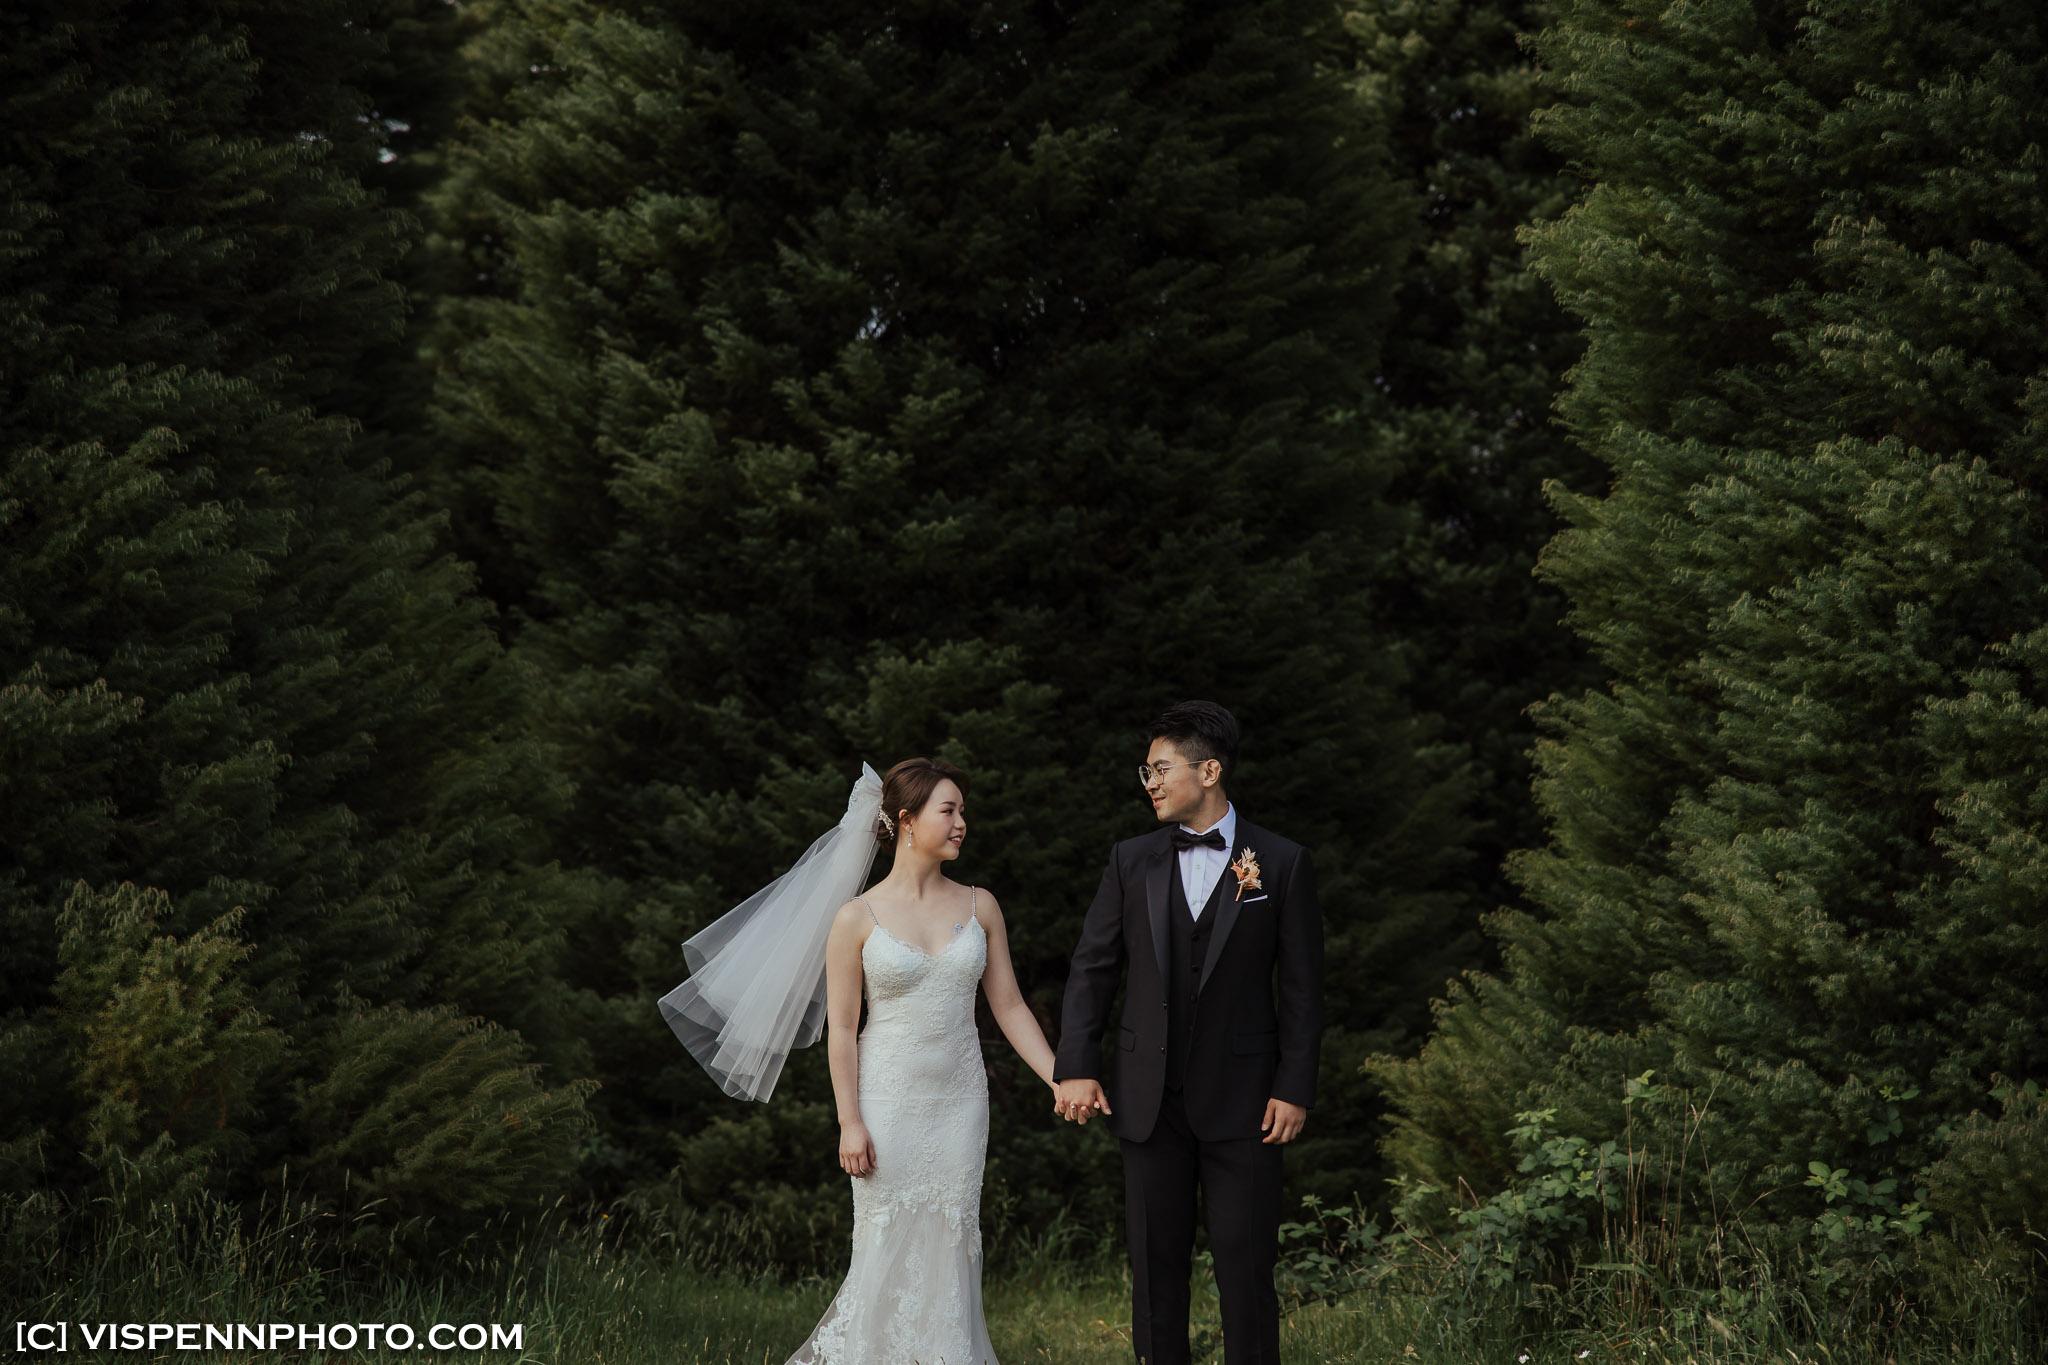 WEDDING DAY Photography Melbourne VISPENN 墨尔本 婚礼跟拍 婚礼摄像 婚礼摄影 结婚照 登记照 ElitaPB 06674 1P EOSR VISPENN